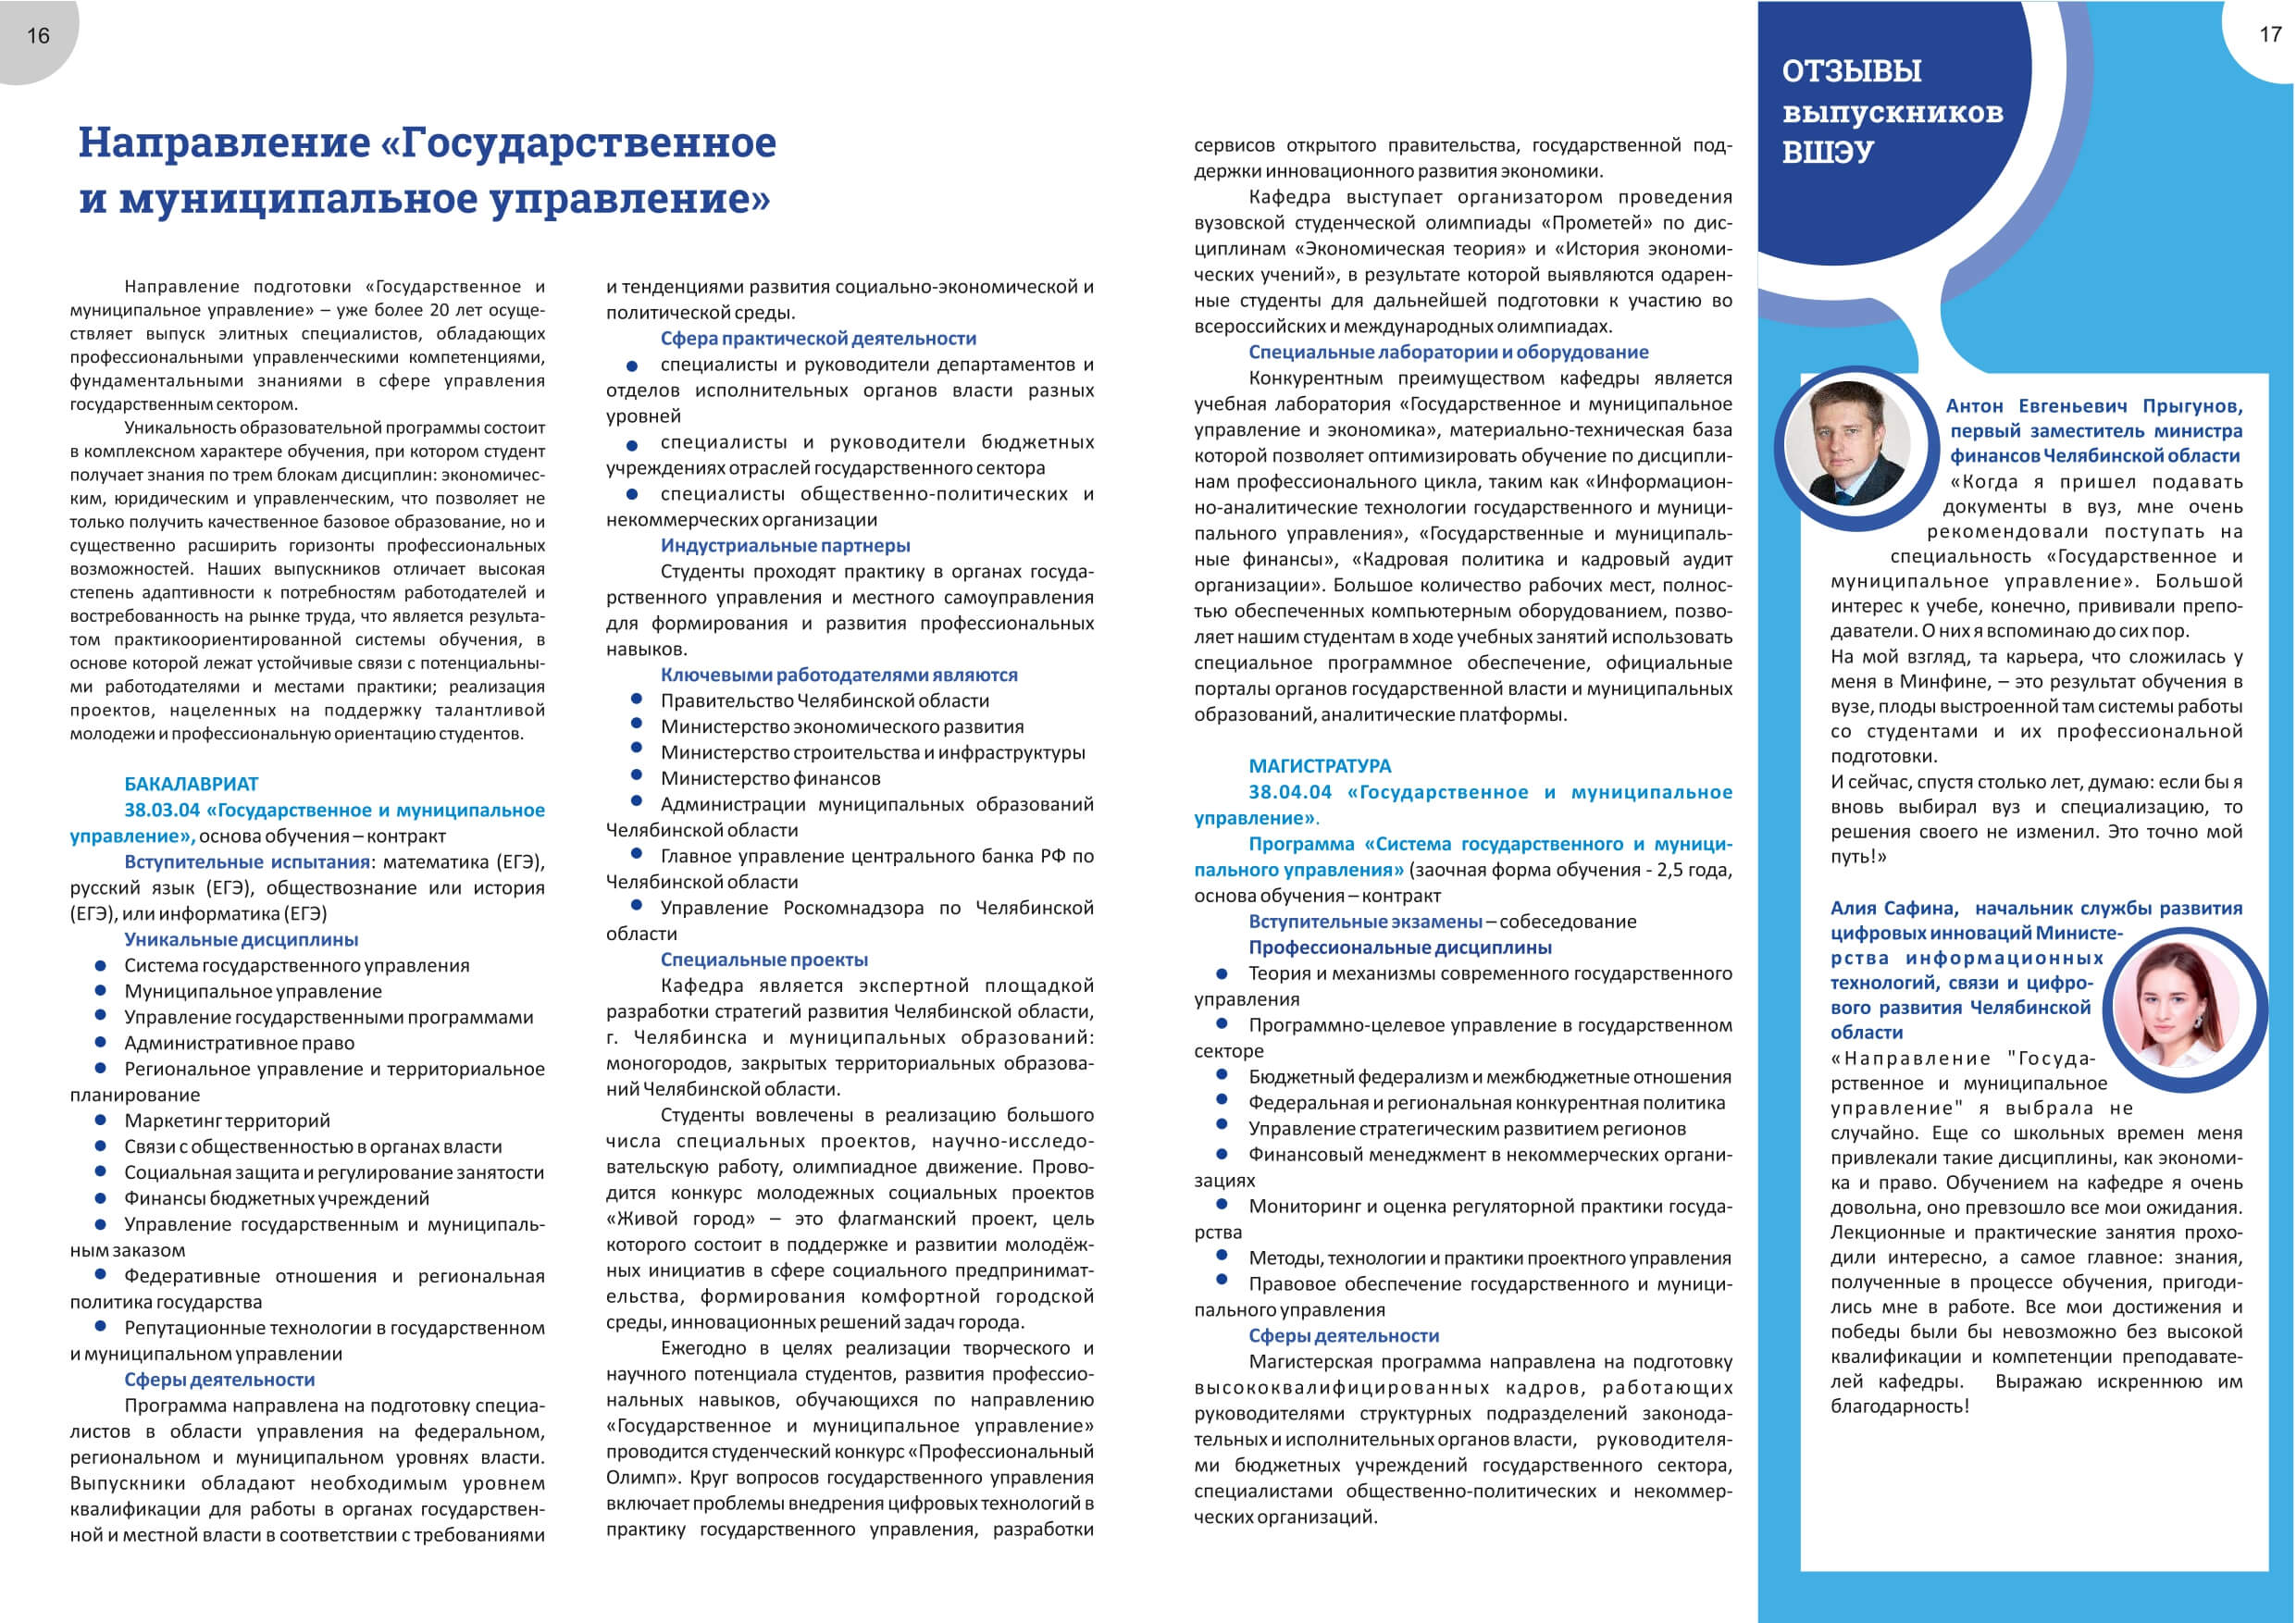 ВШЭУ Прием абитуриентов 2021_pages-to-jpg-0009